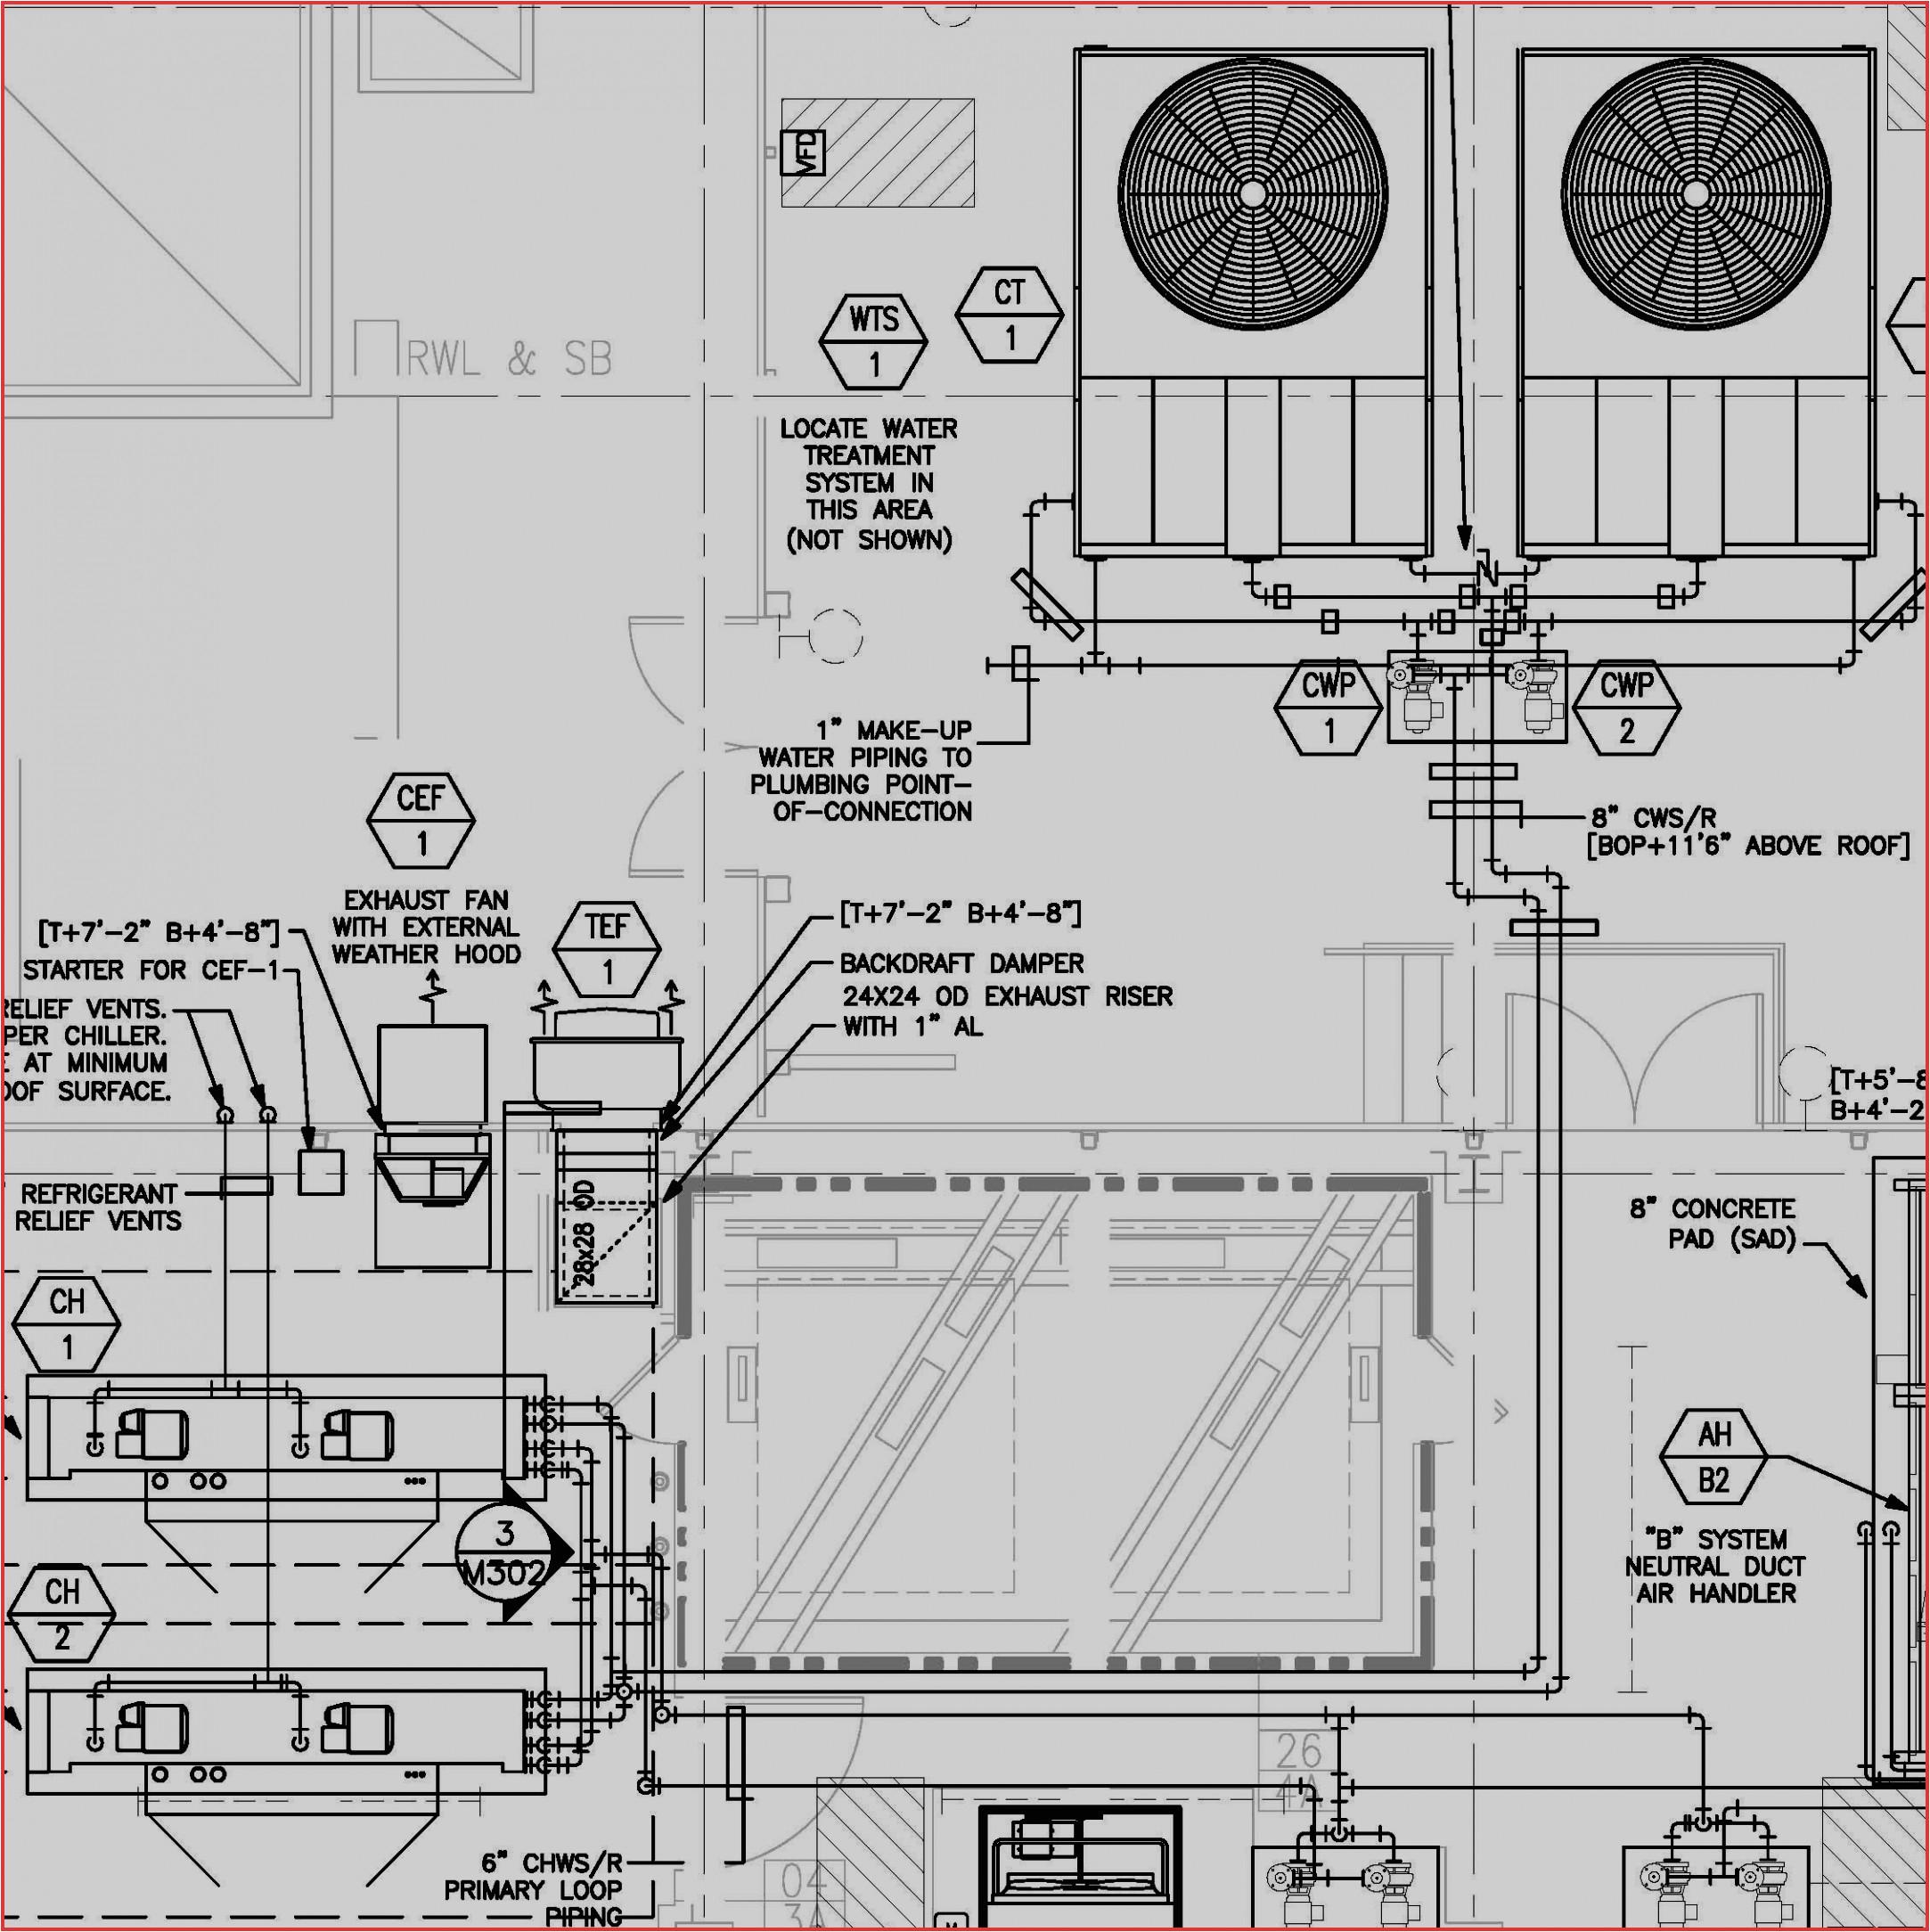 isuzu 2 8 wiring diagram wiring diagram name isuzu 2 8 wiring diagram